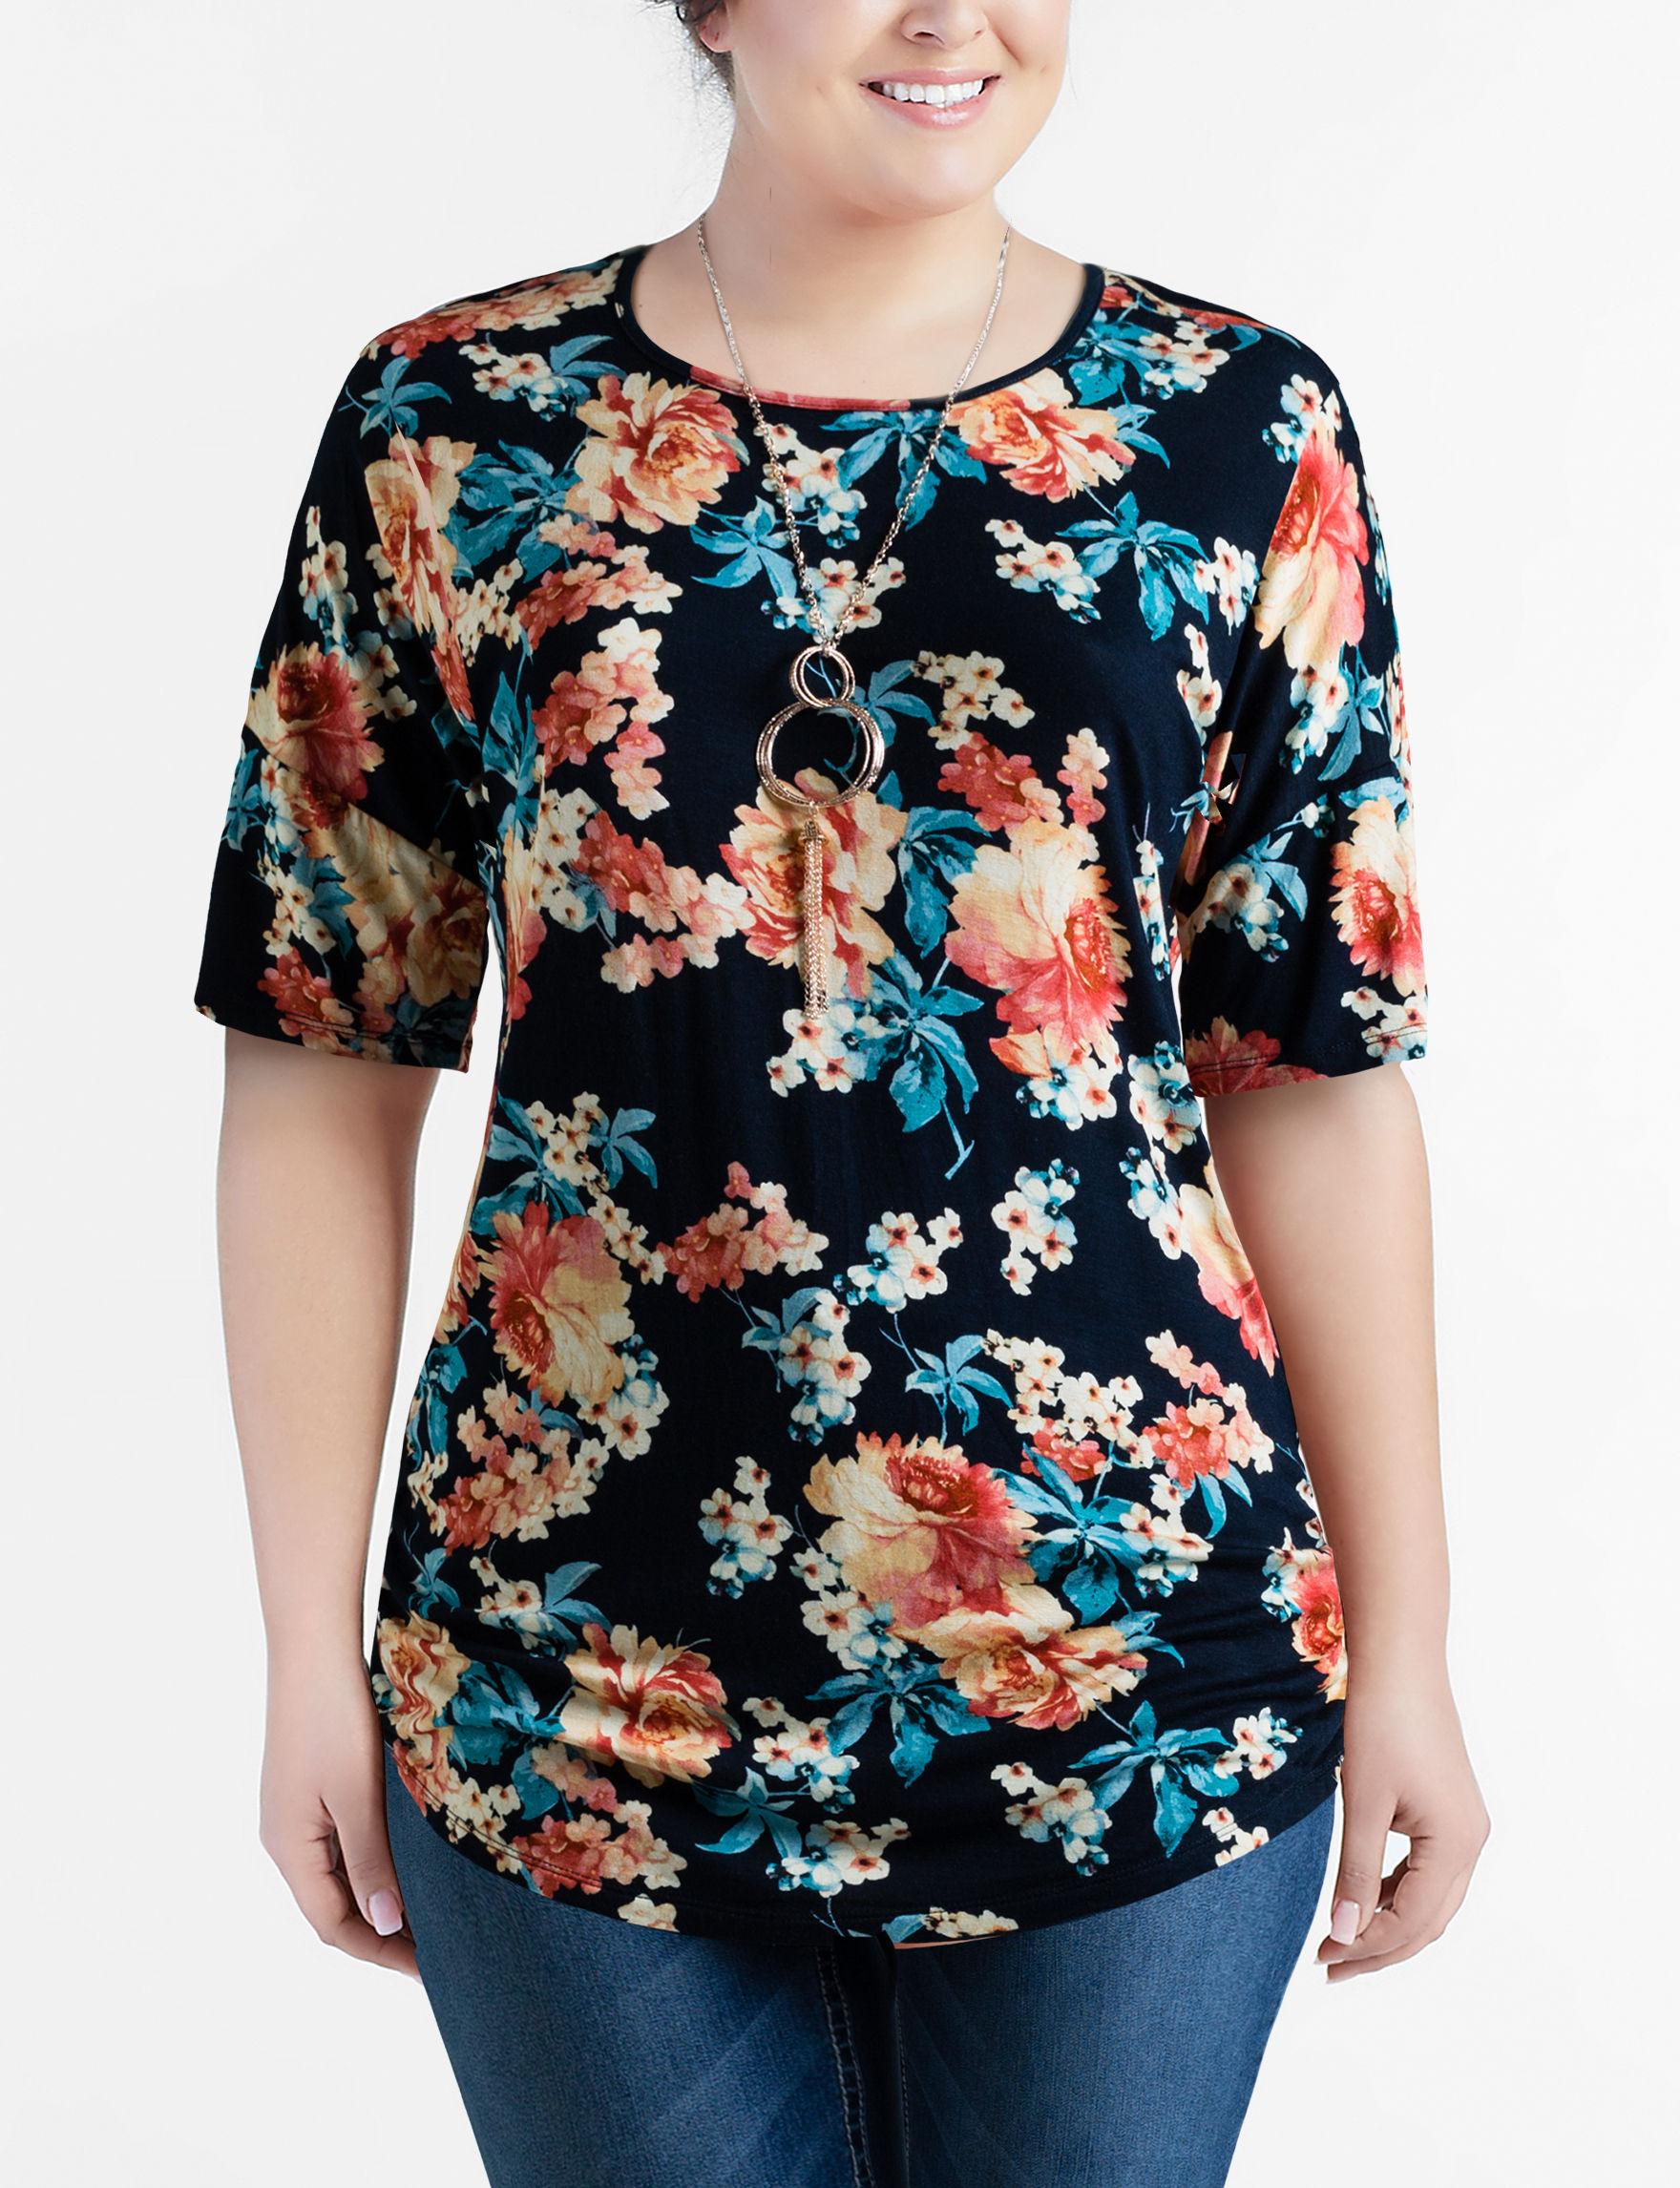 Liberty Love Navy Floral Shirts & Blouses